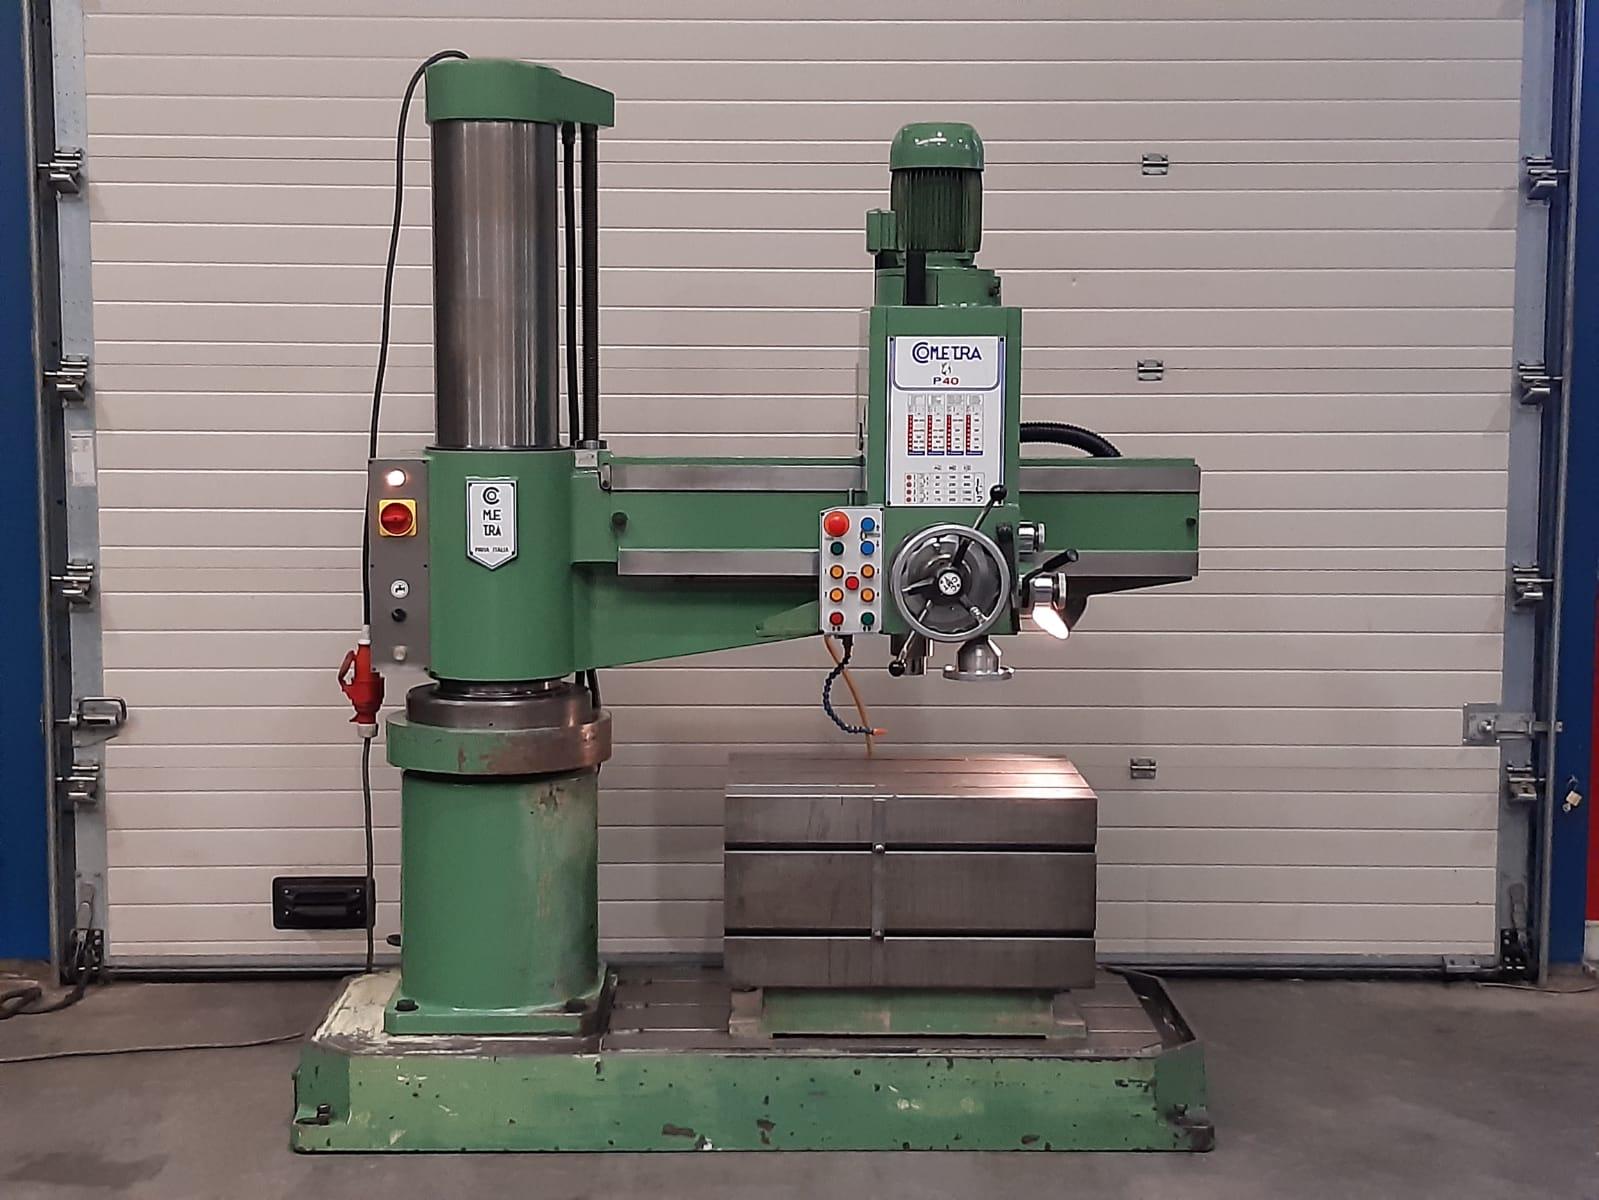 Radial drillpress